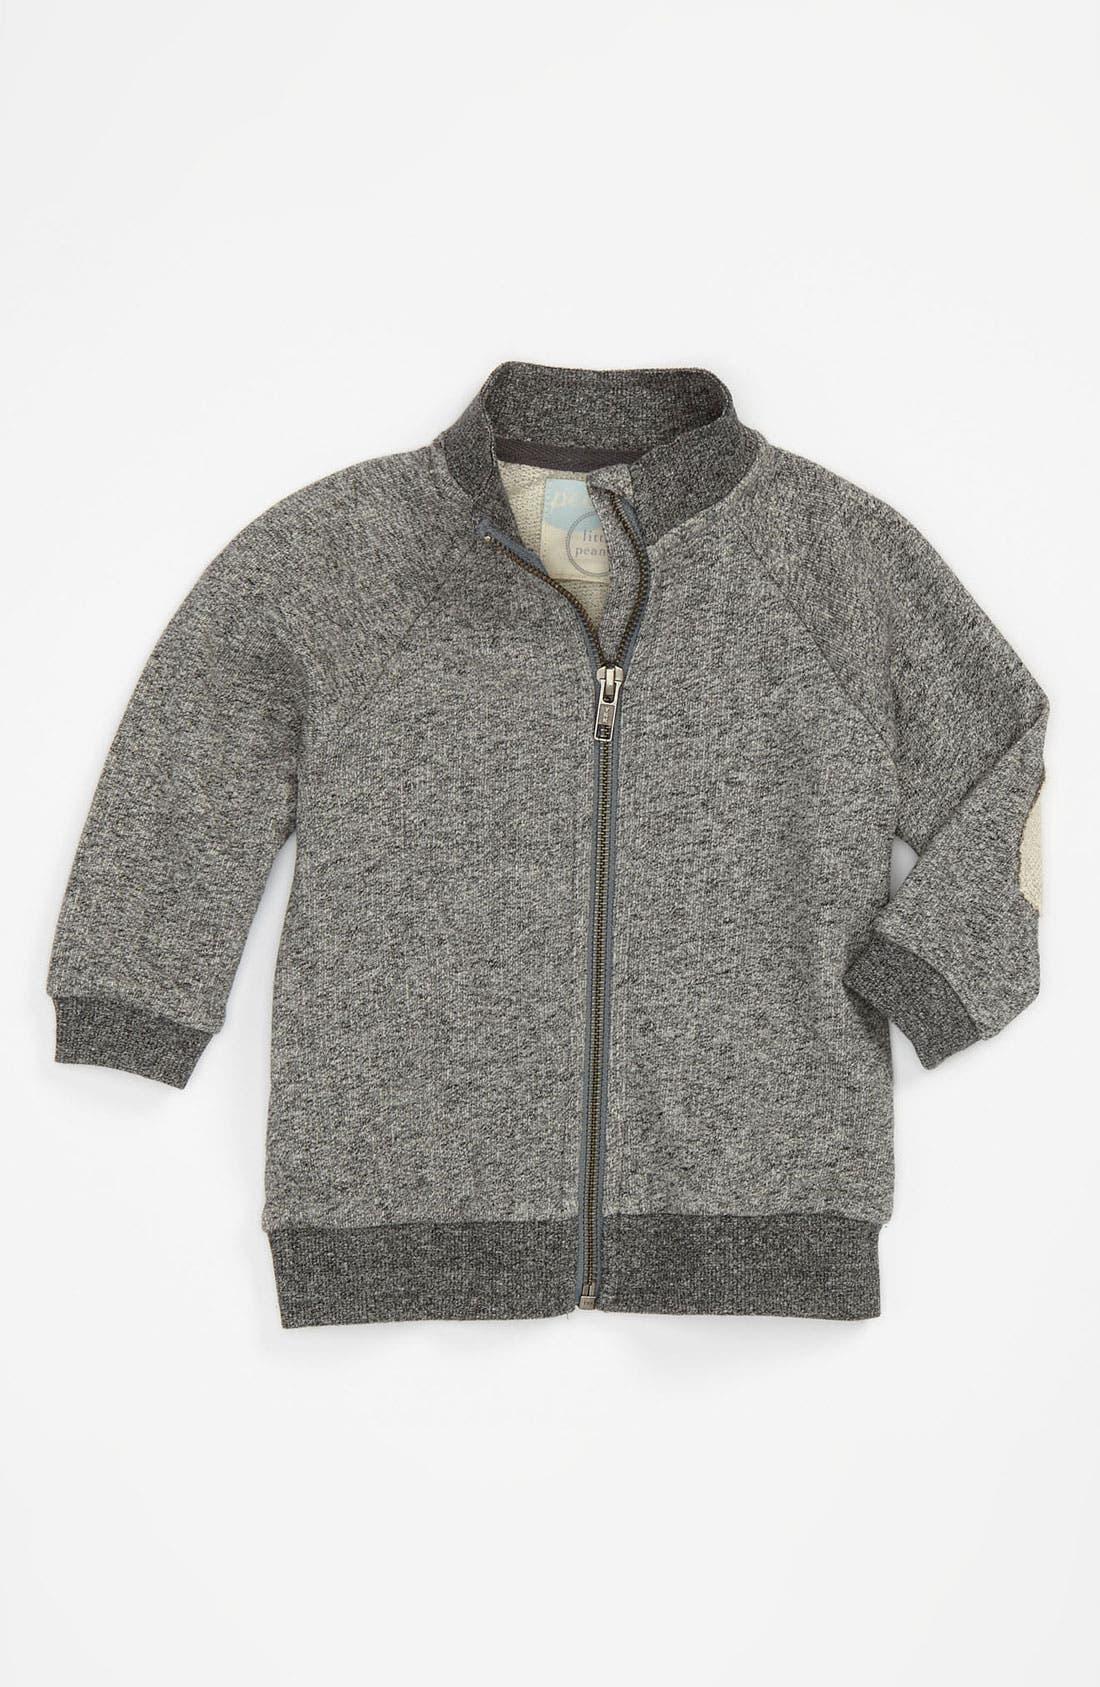 Alternate Image 1 Selected - Peek 'Caiden' Sweater (Infant)